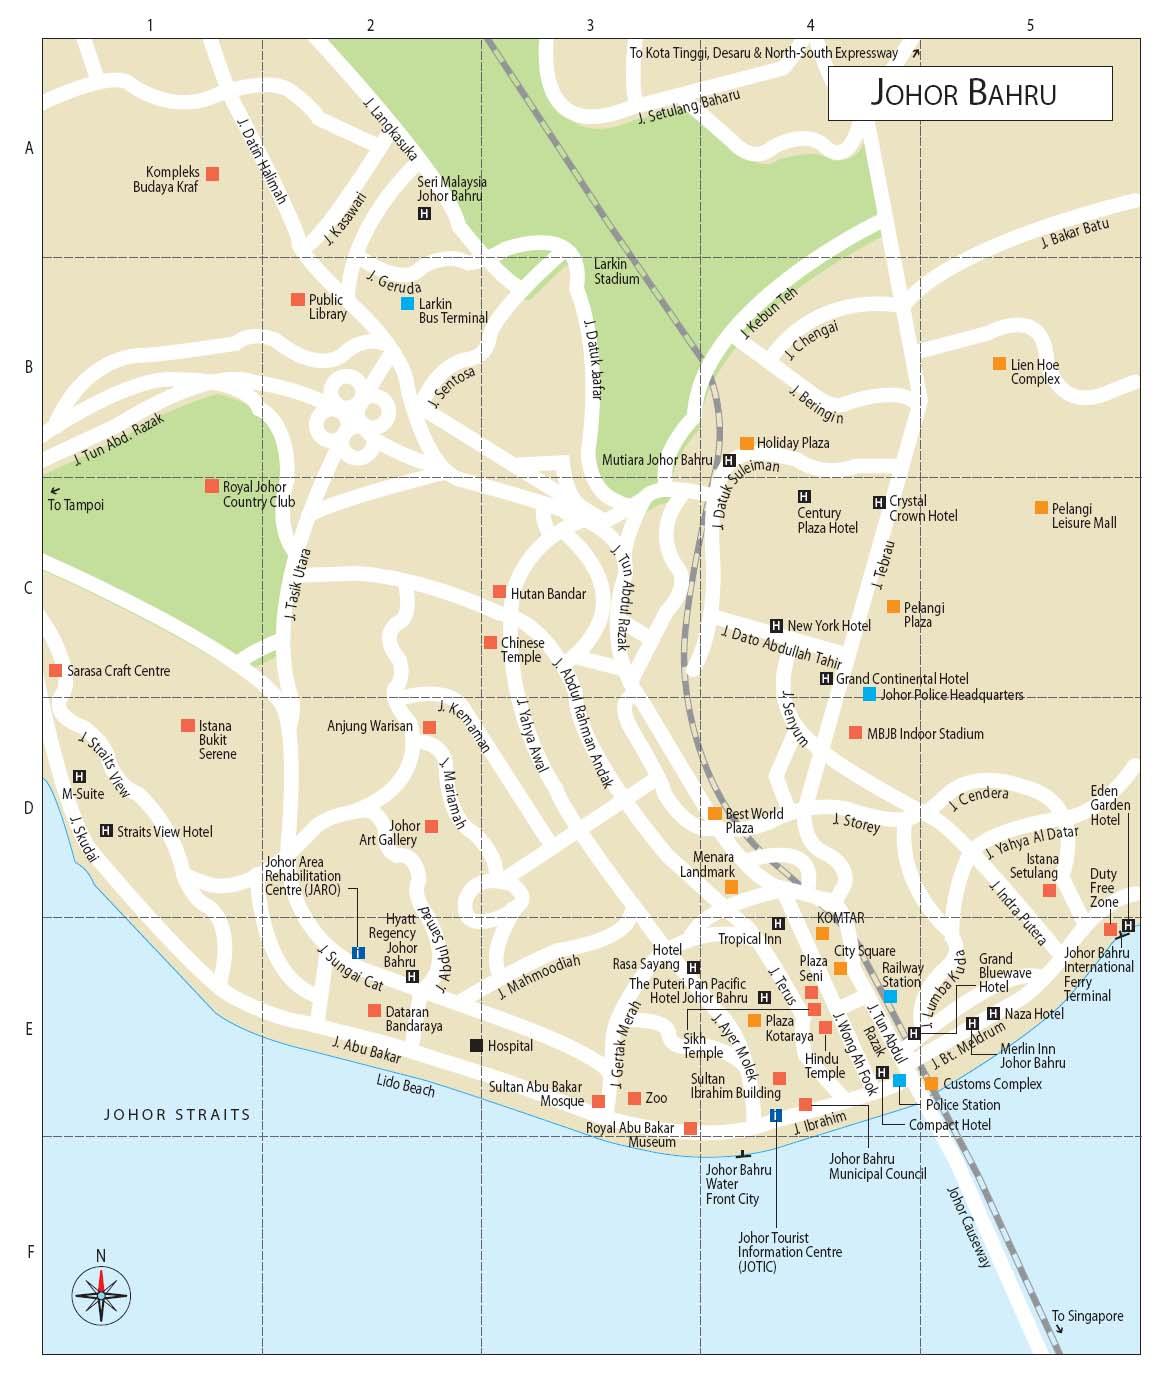 Duke Amiene Rev: Tempat-tempat Menarik di Johor Bahru